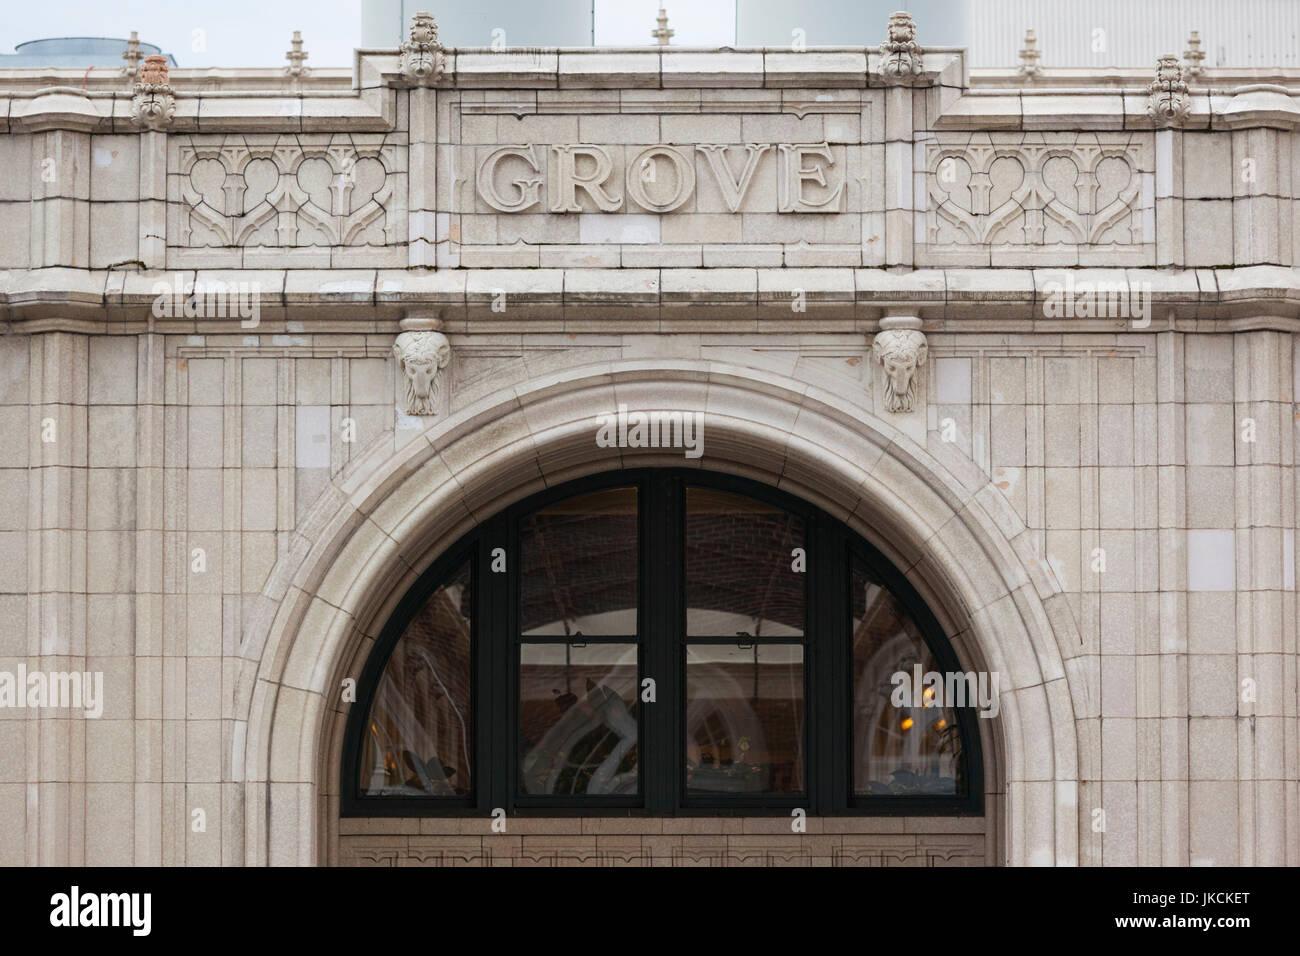 USA, North Carolina, Asheville, Grove Arcade Public Market, exterior - Stock Image